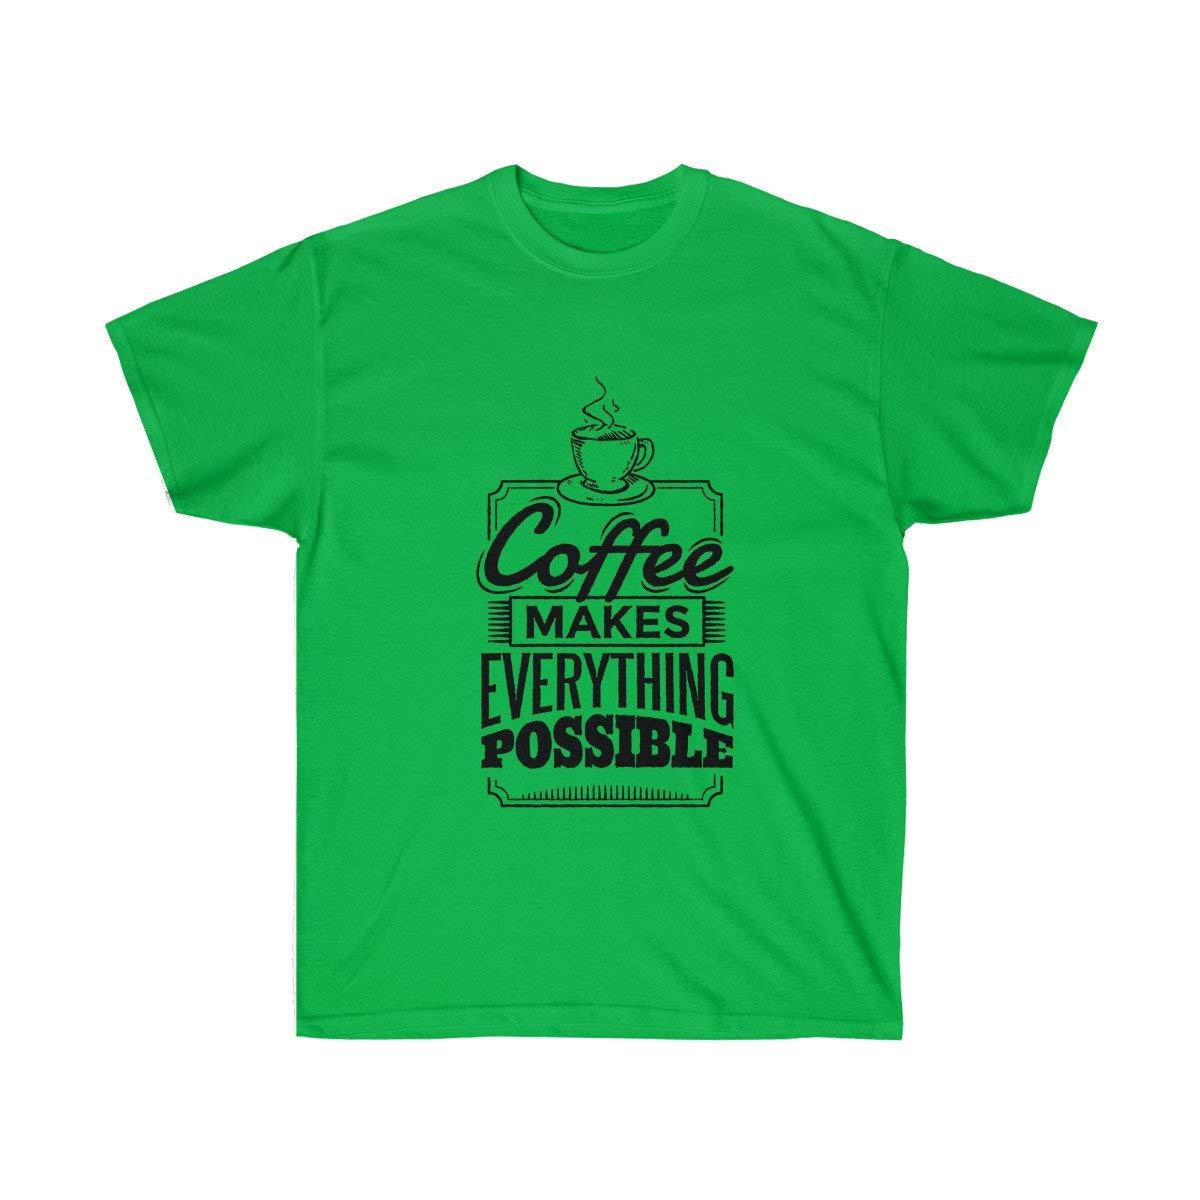 Tee Coffee Makes Everything Possible Tshirt